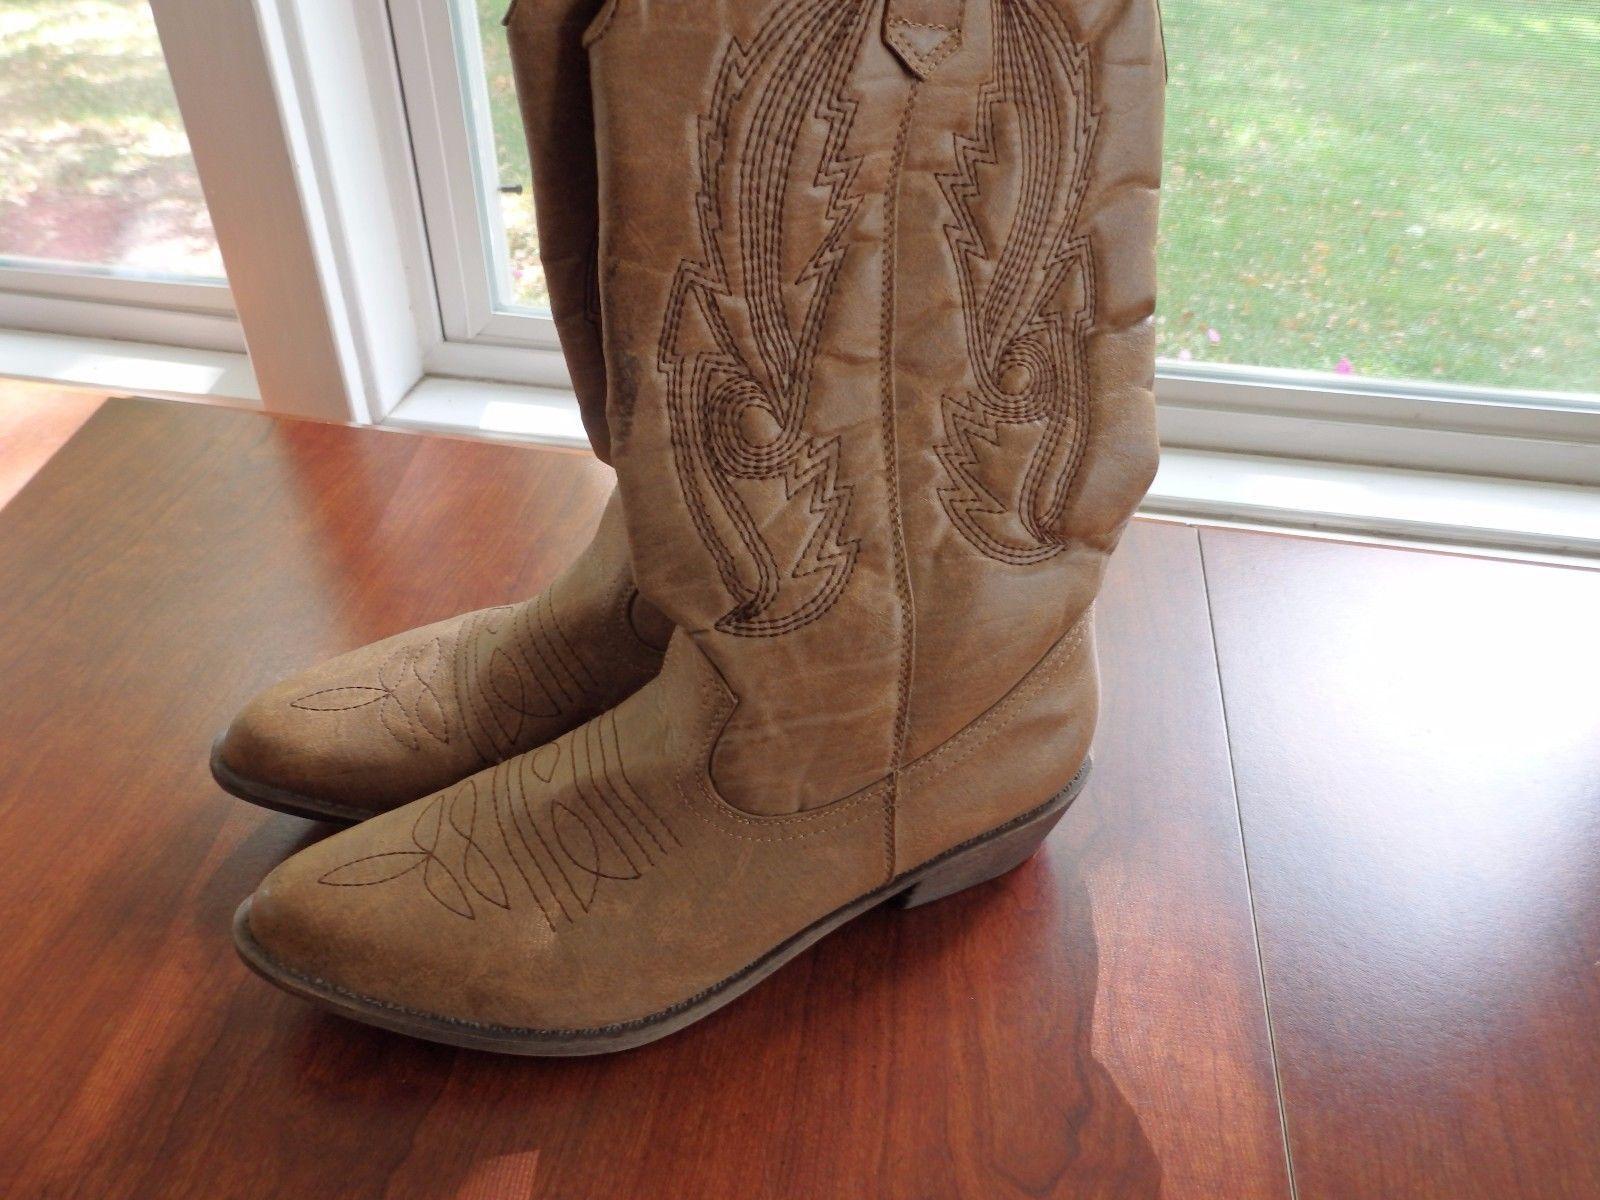 bb3b1b42038 Coconuts-Gaucho-Cowboy-Boots-SIZE-8.5 M and 50 similar items